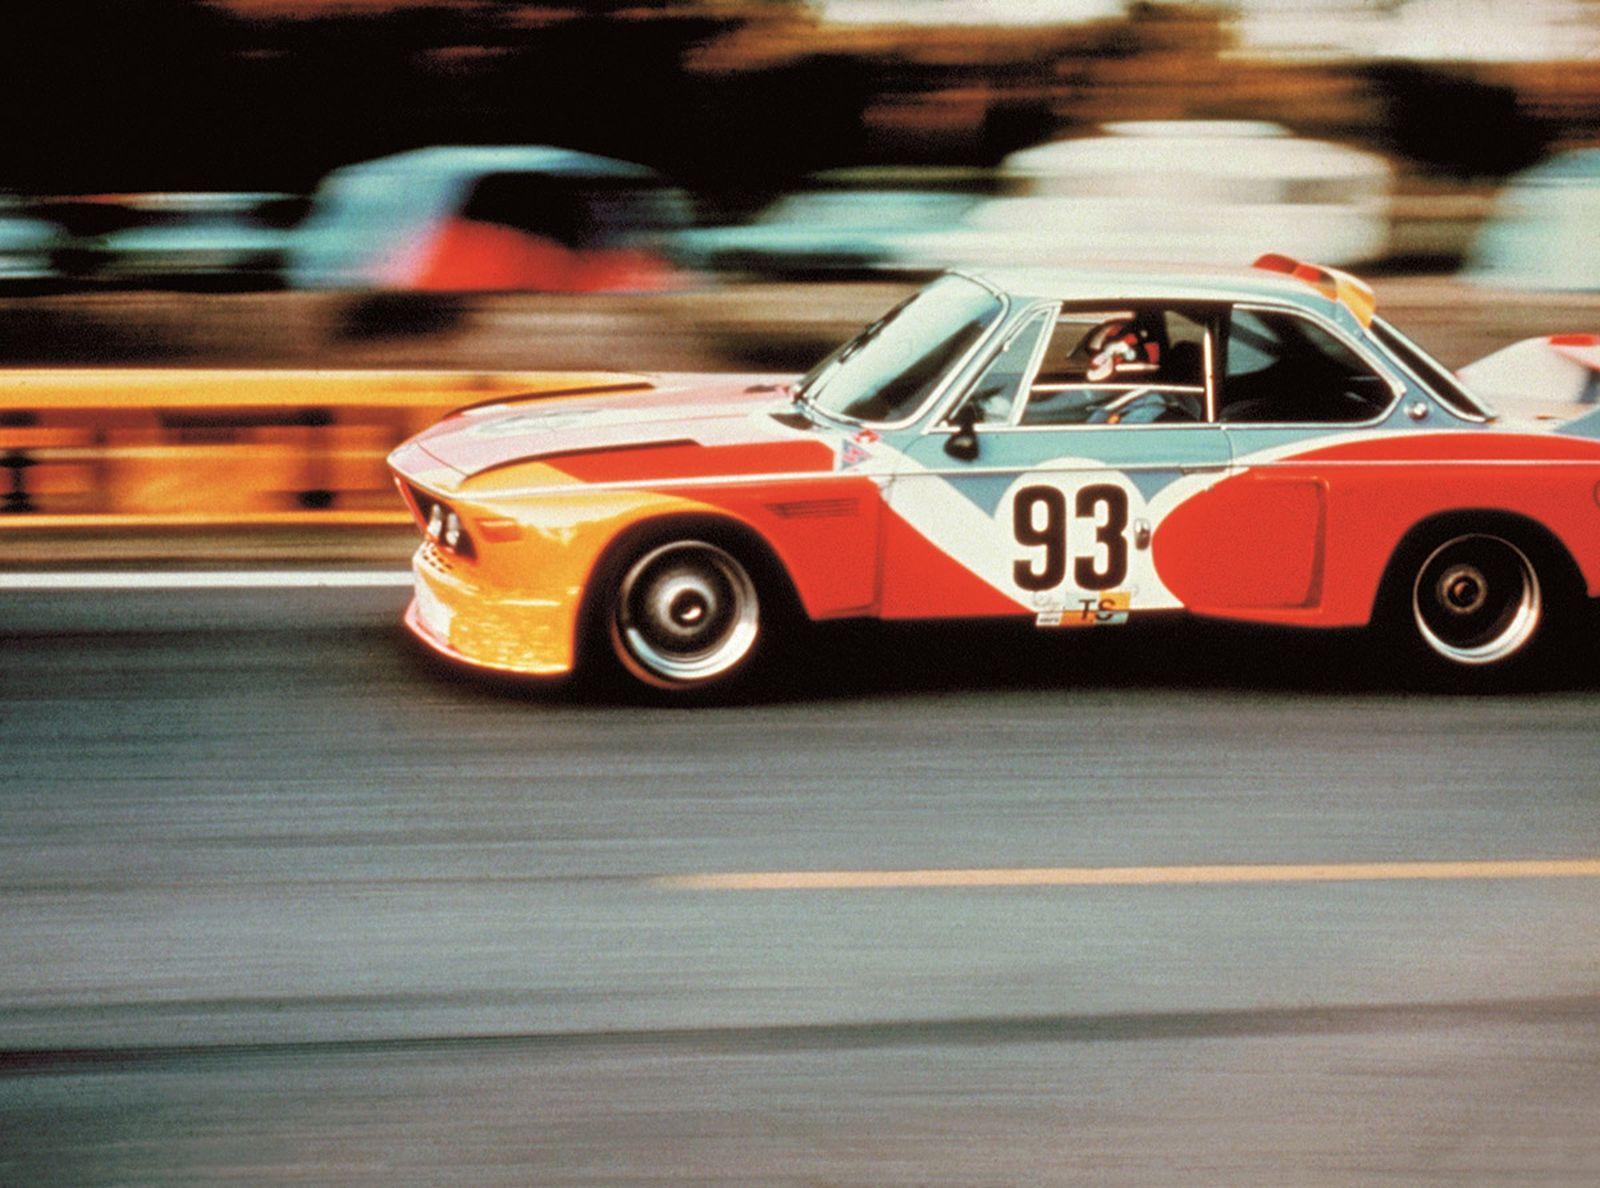 BMW Art Car 01, Alexander Calder, 1975